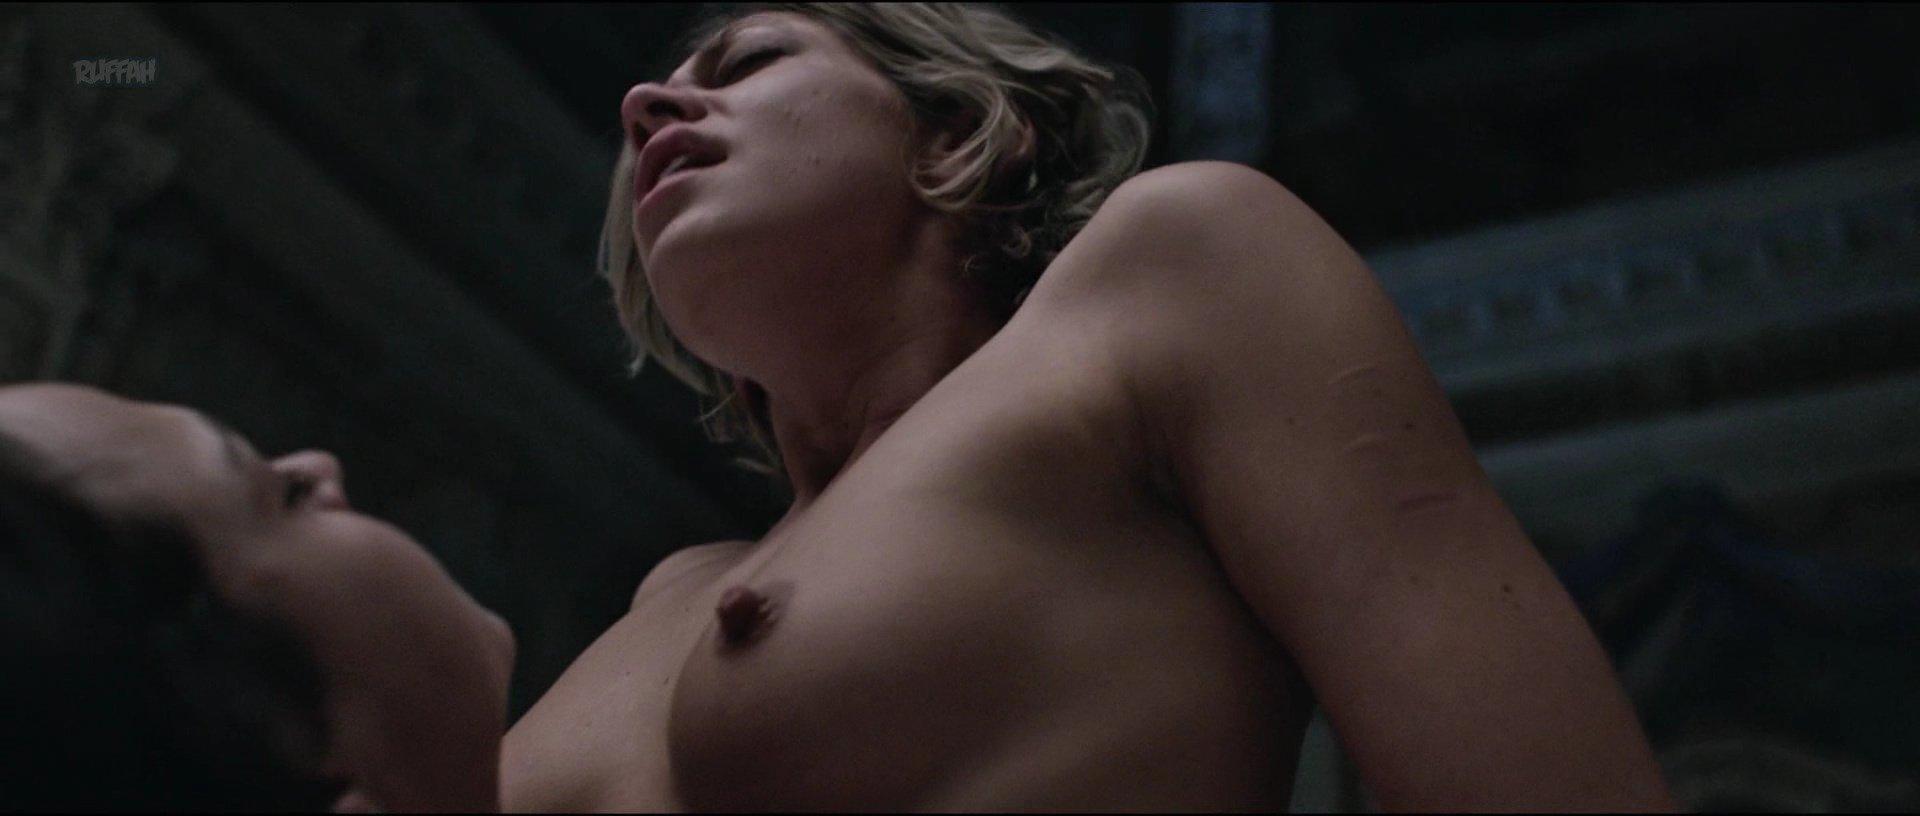 Marta Gastini nude, Analeigh Tipton nude - Compulsion (2016)